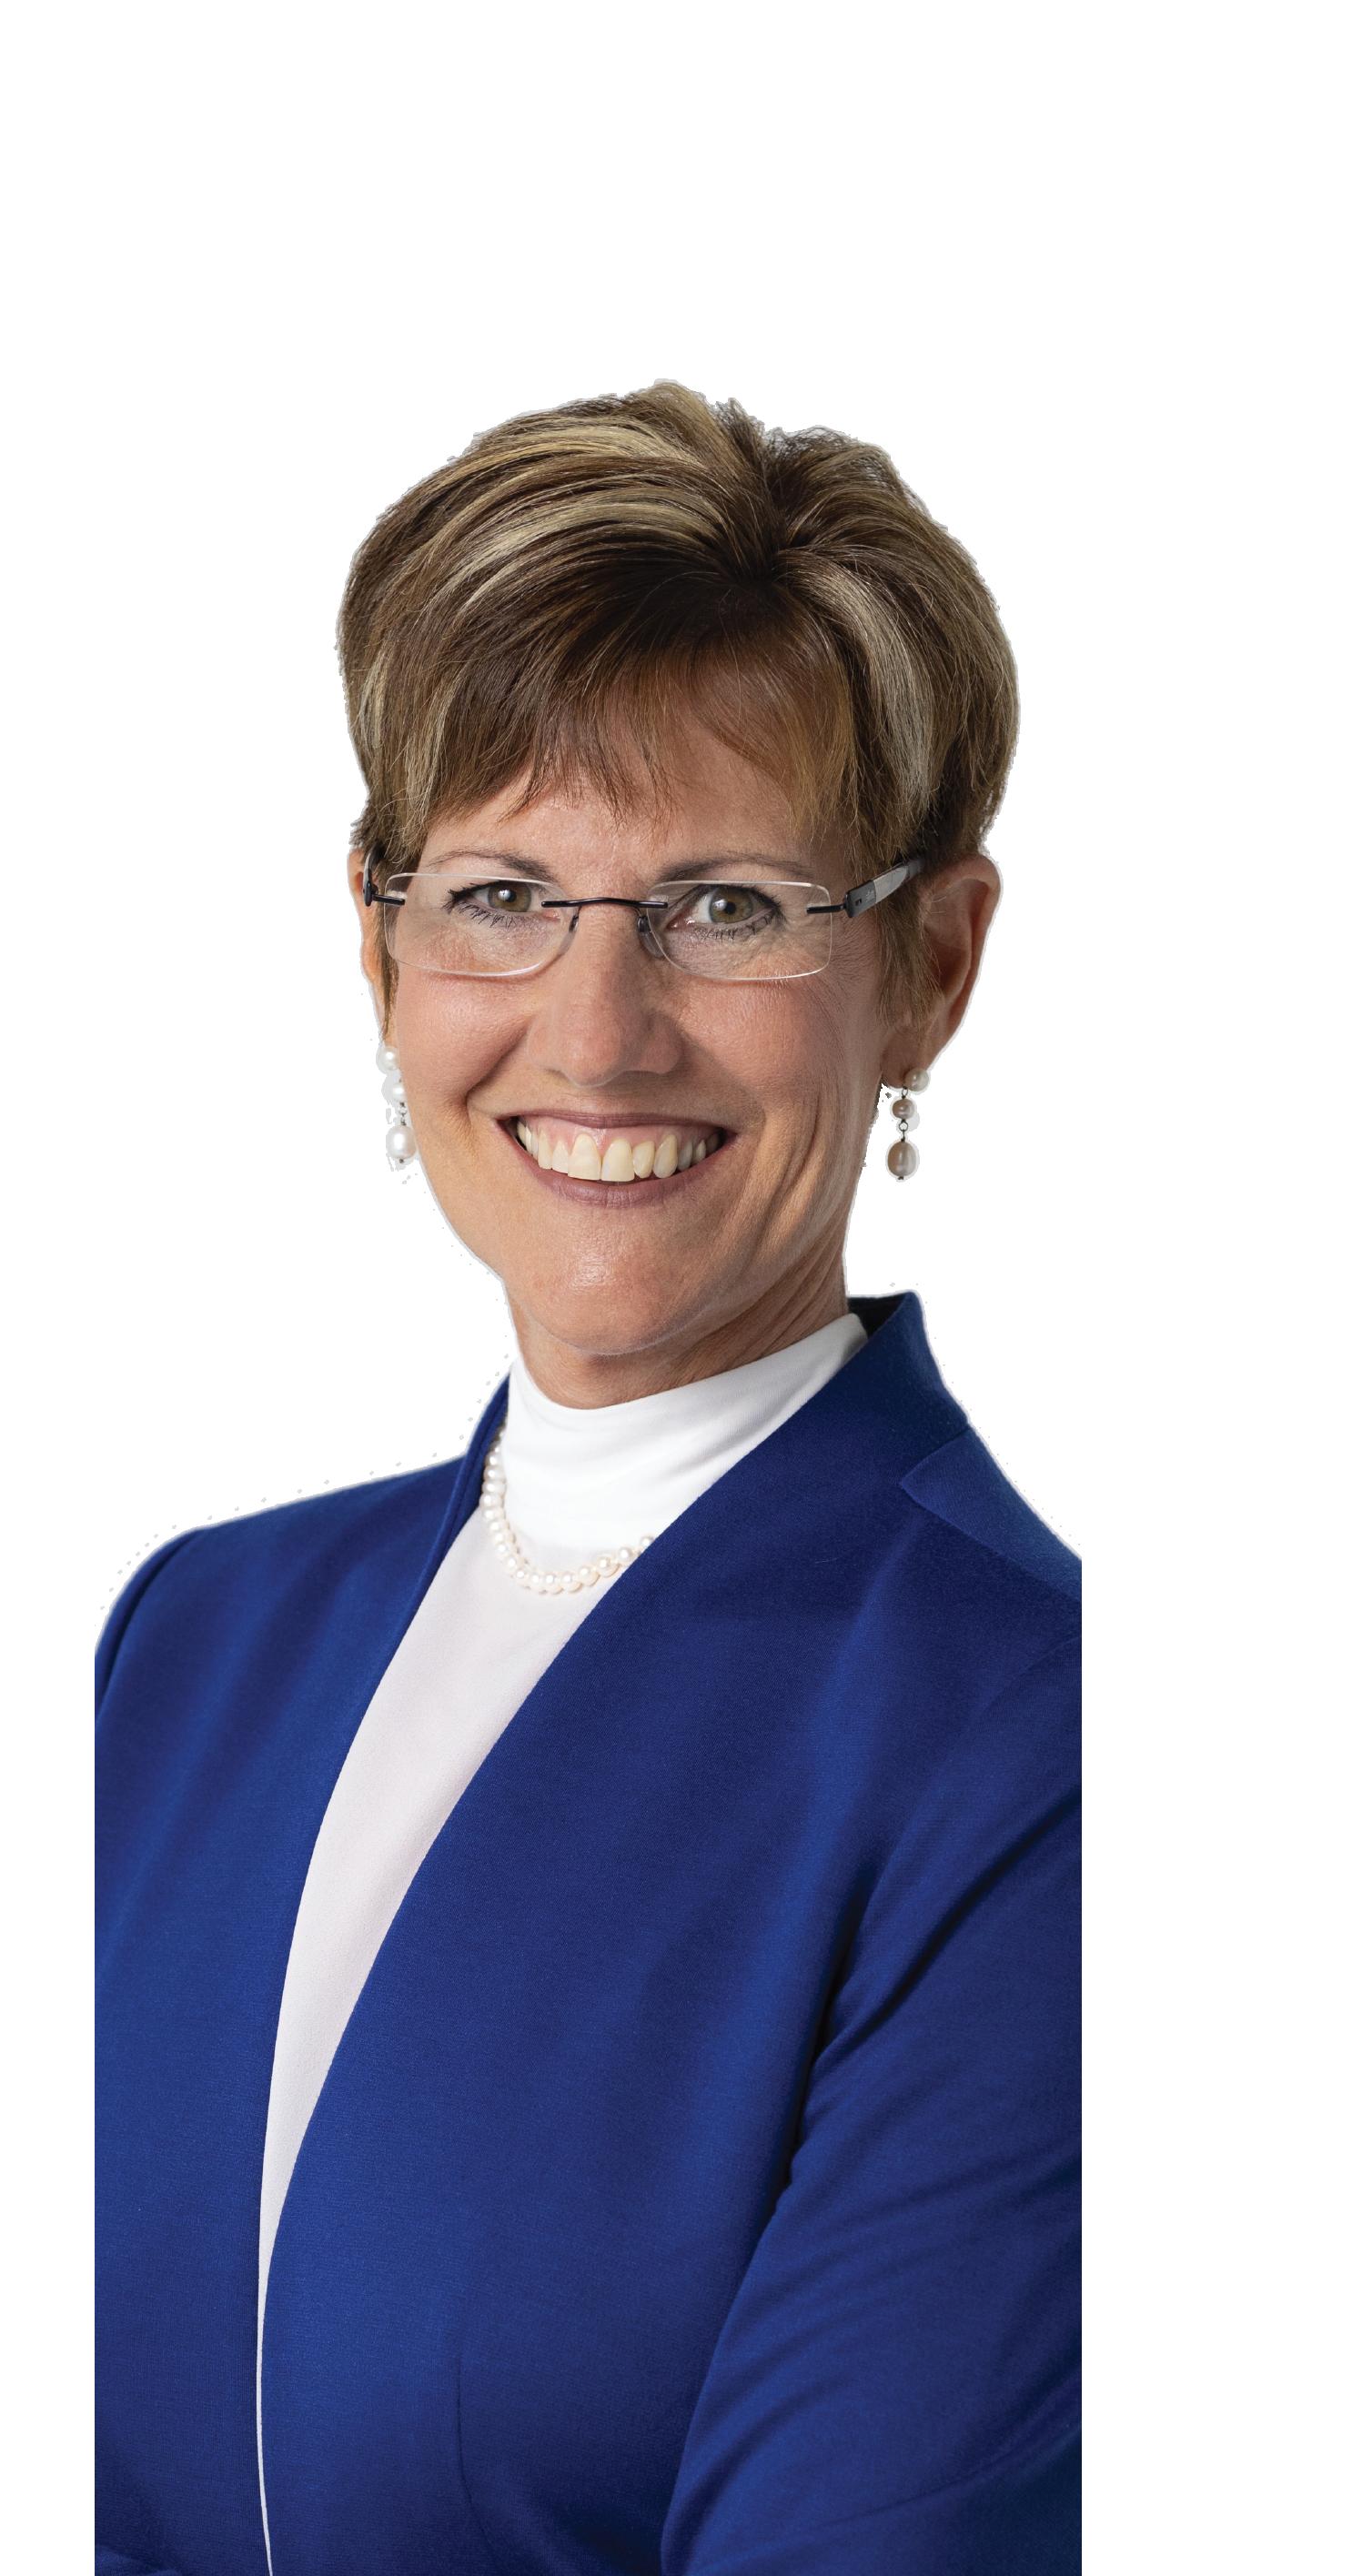 Kim Gustafson - Consumer Loan Officerkim@dilloncu.com☎ Ext. 2002